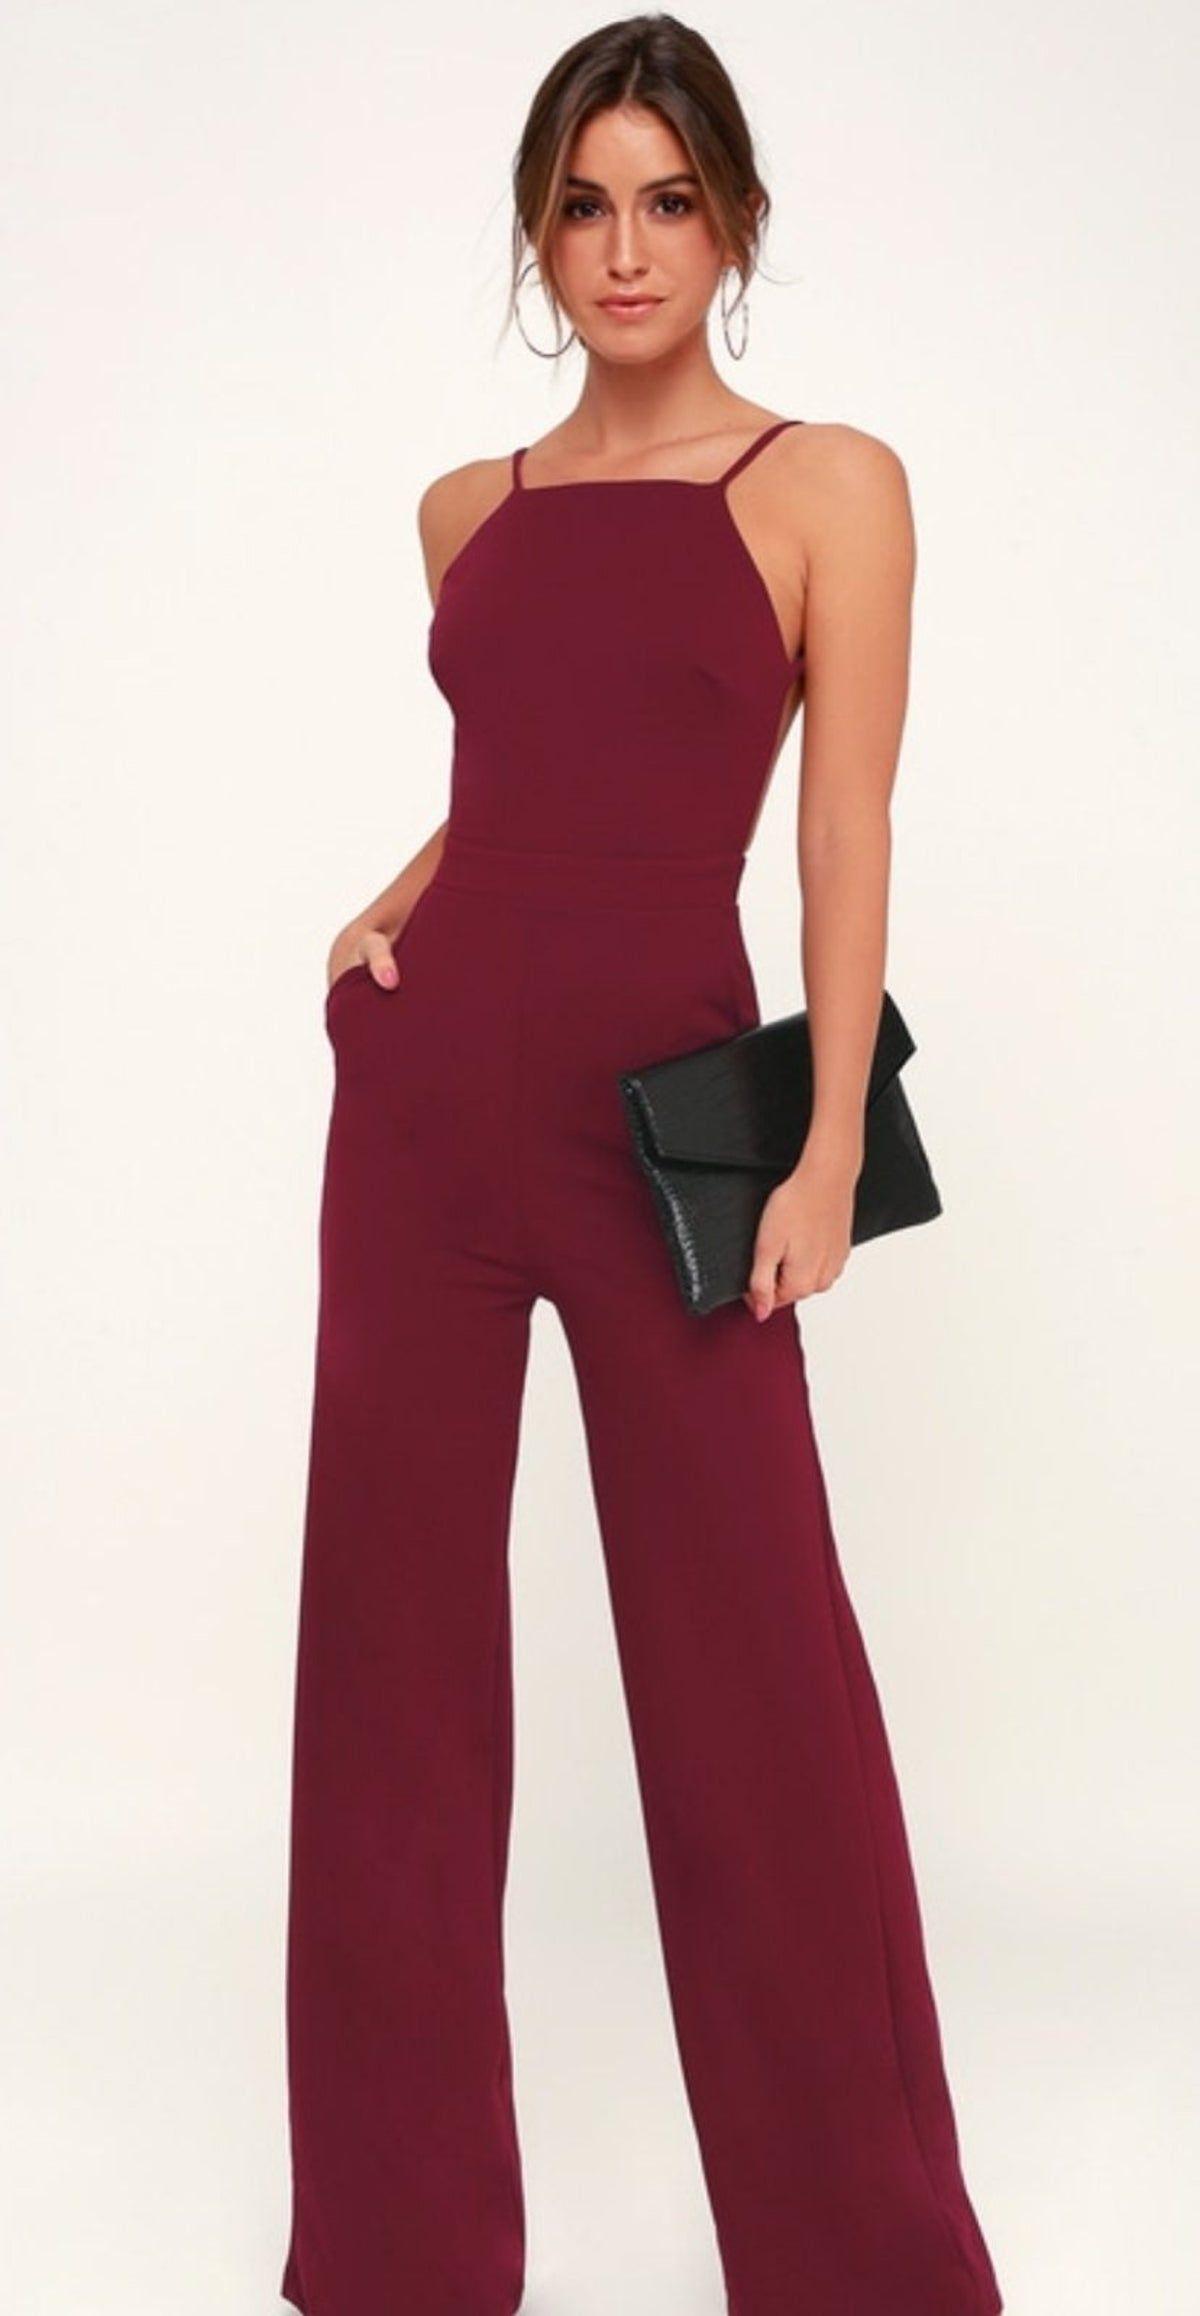 Power Of Love Wine Jumpsuit In 2020 Classy Jumpsuits For Weddings Classy Jumpsuit Jumpsuit Outfit Wedding